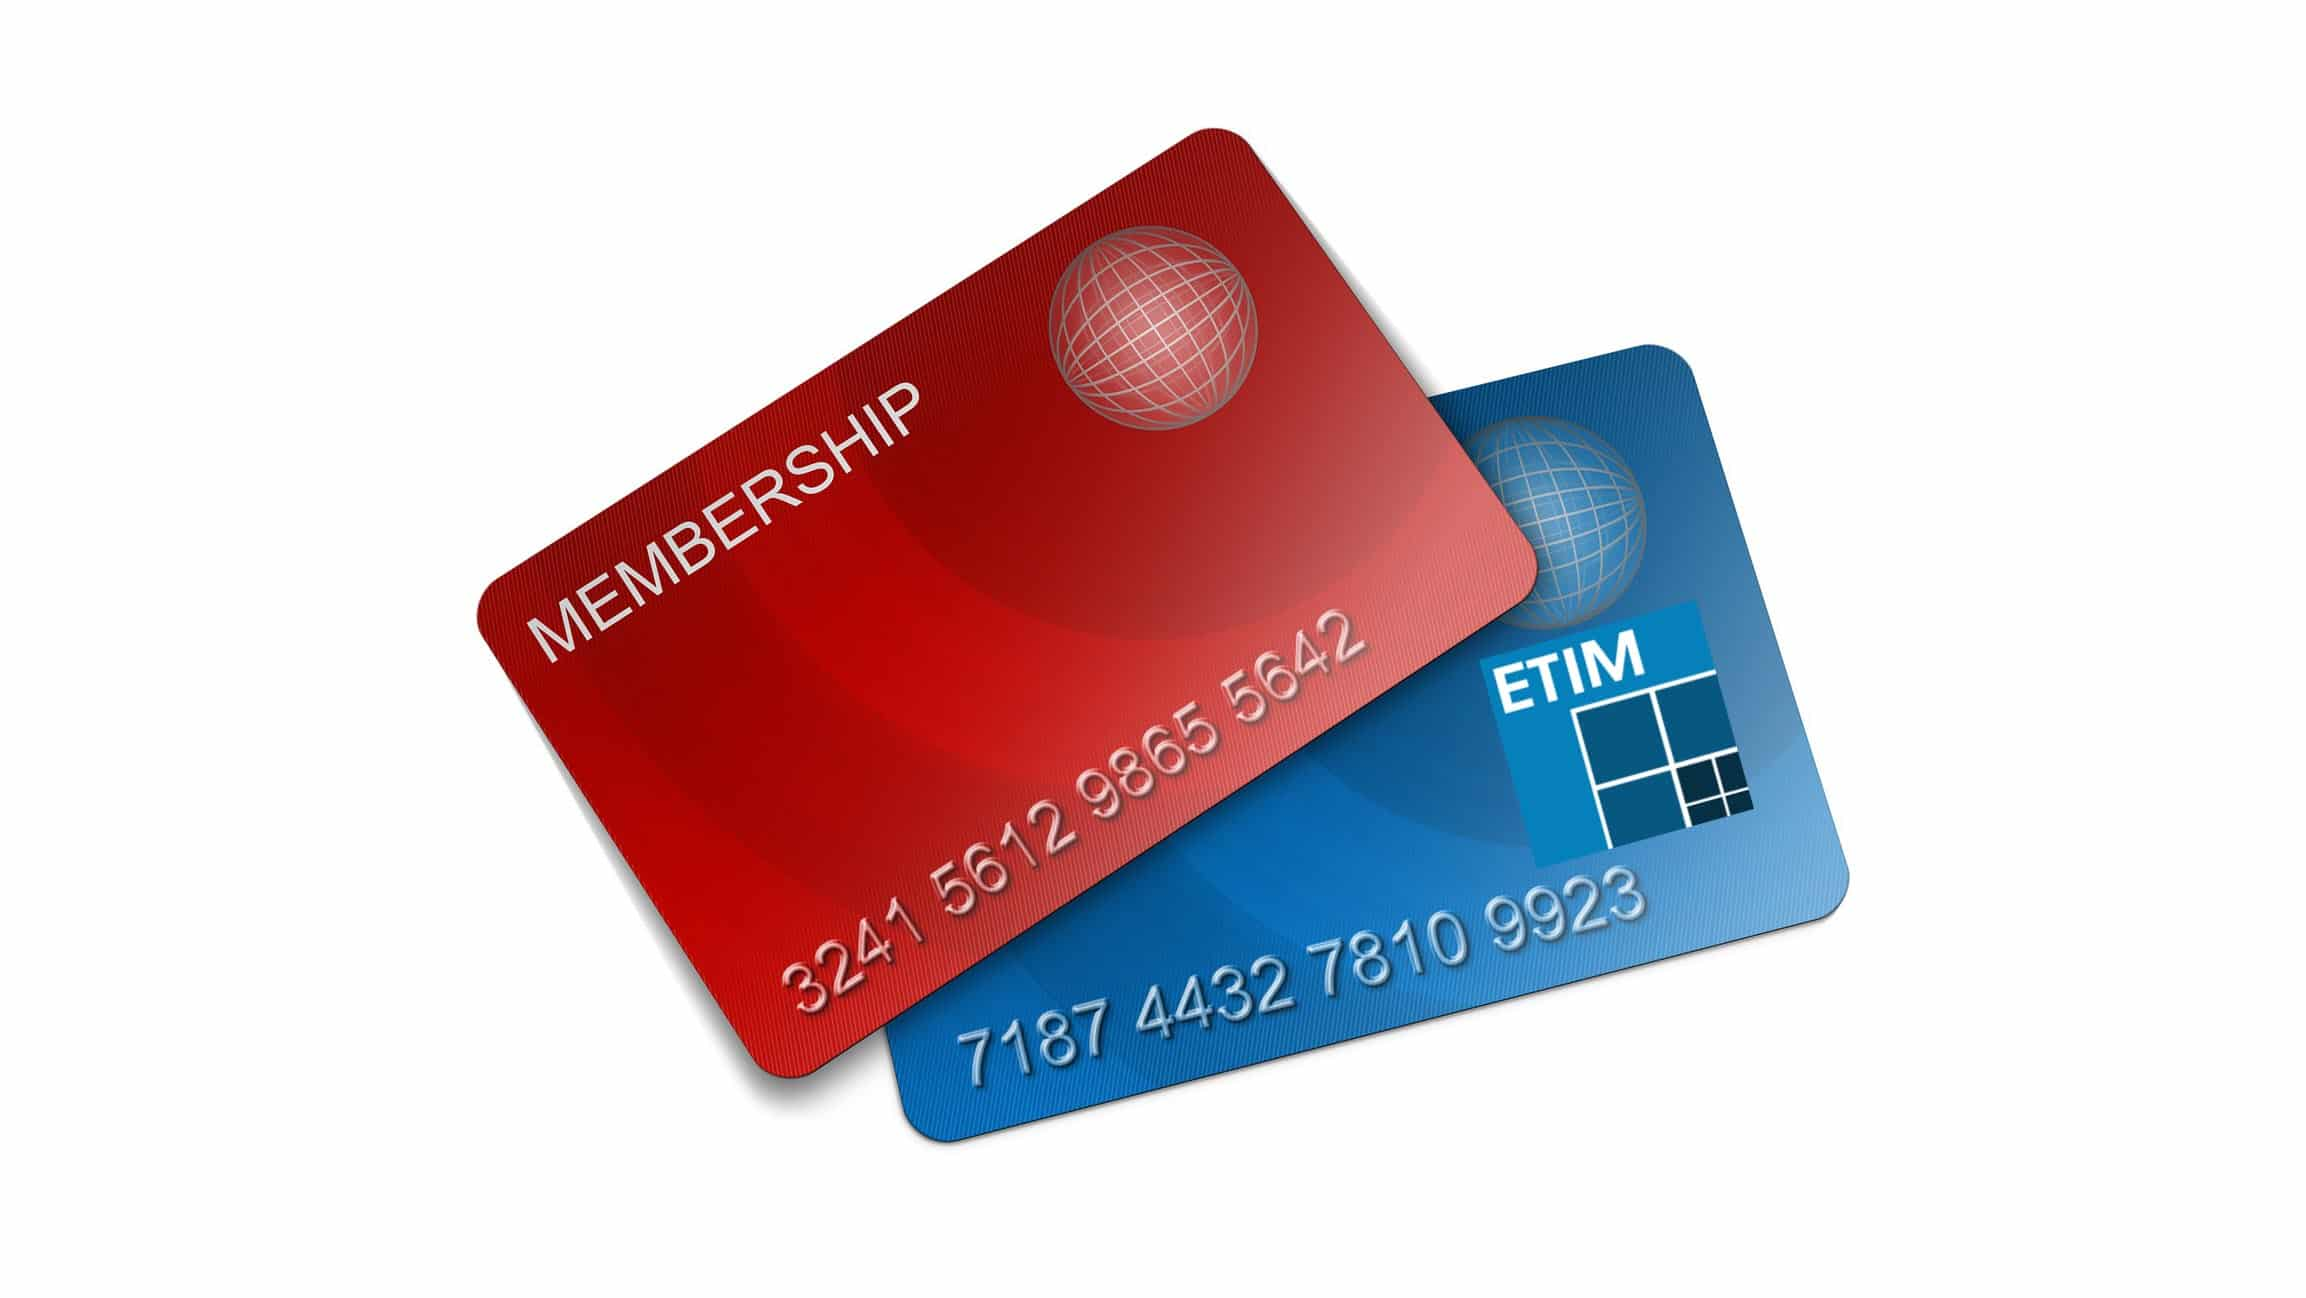 Memo on ETIM membership benefits